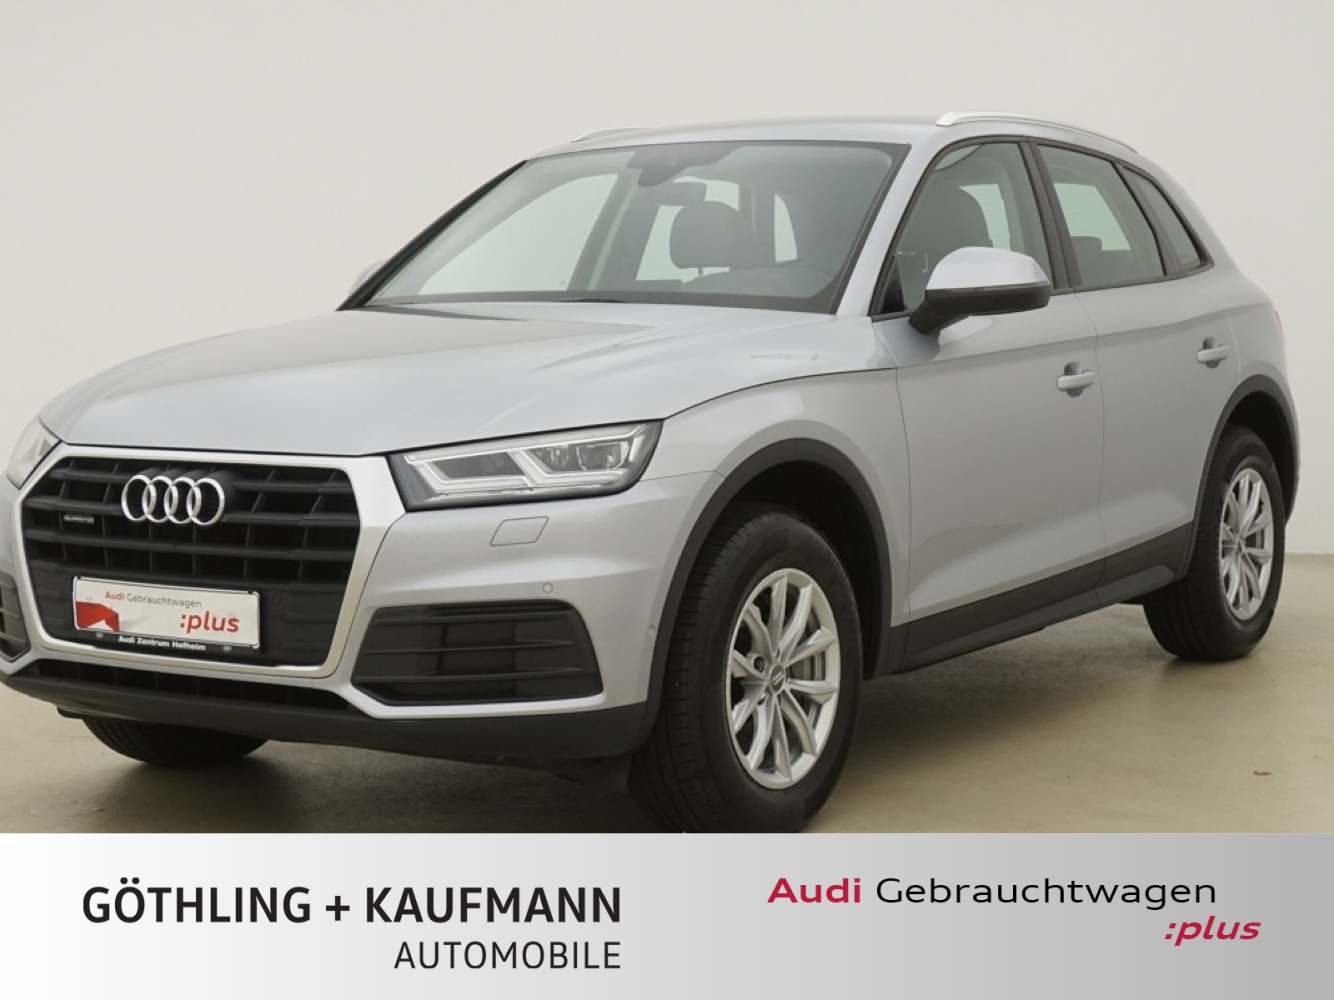 Audi Q5 2.0 TDI qu. S tro 140kW*Navi+*MatrixLED*SHZ*S, Jahr 2017, Diesel